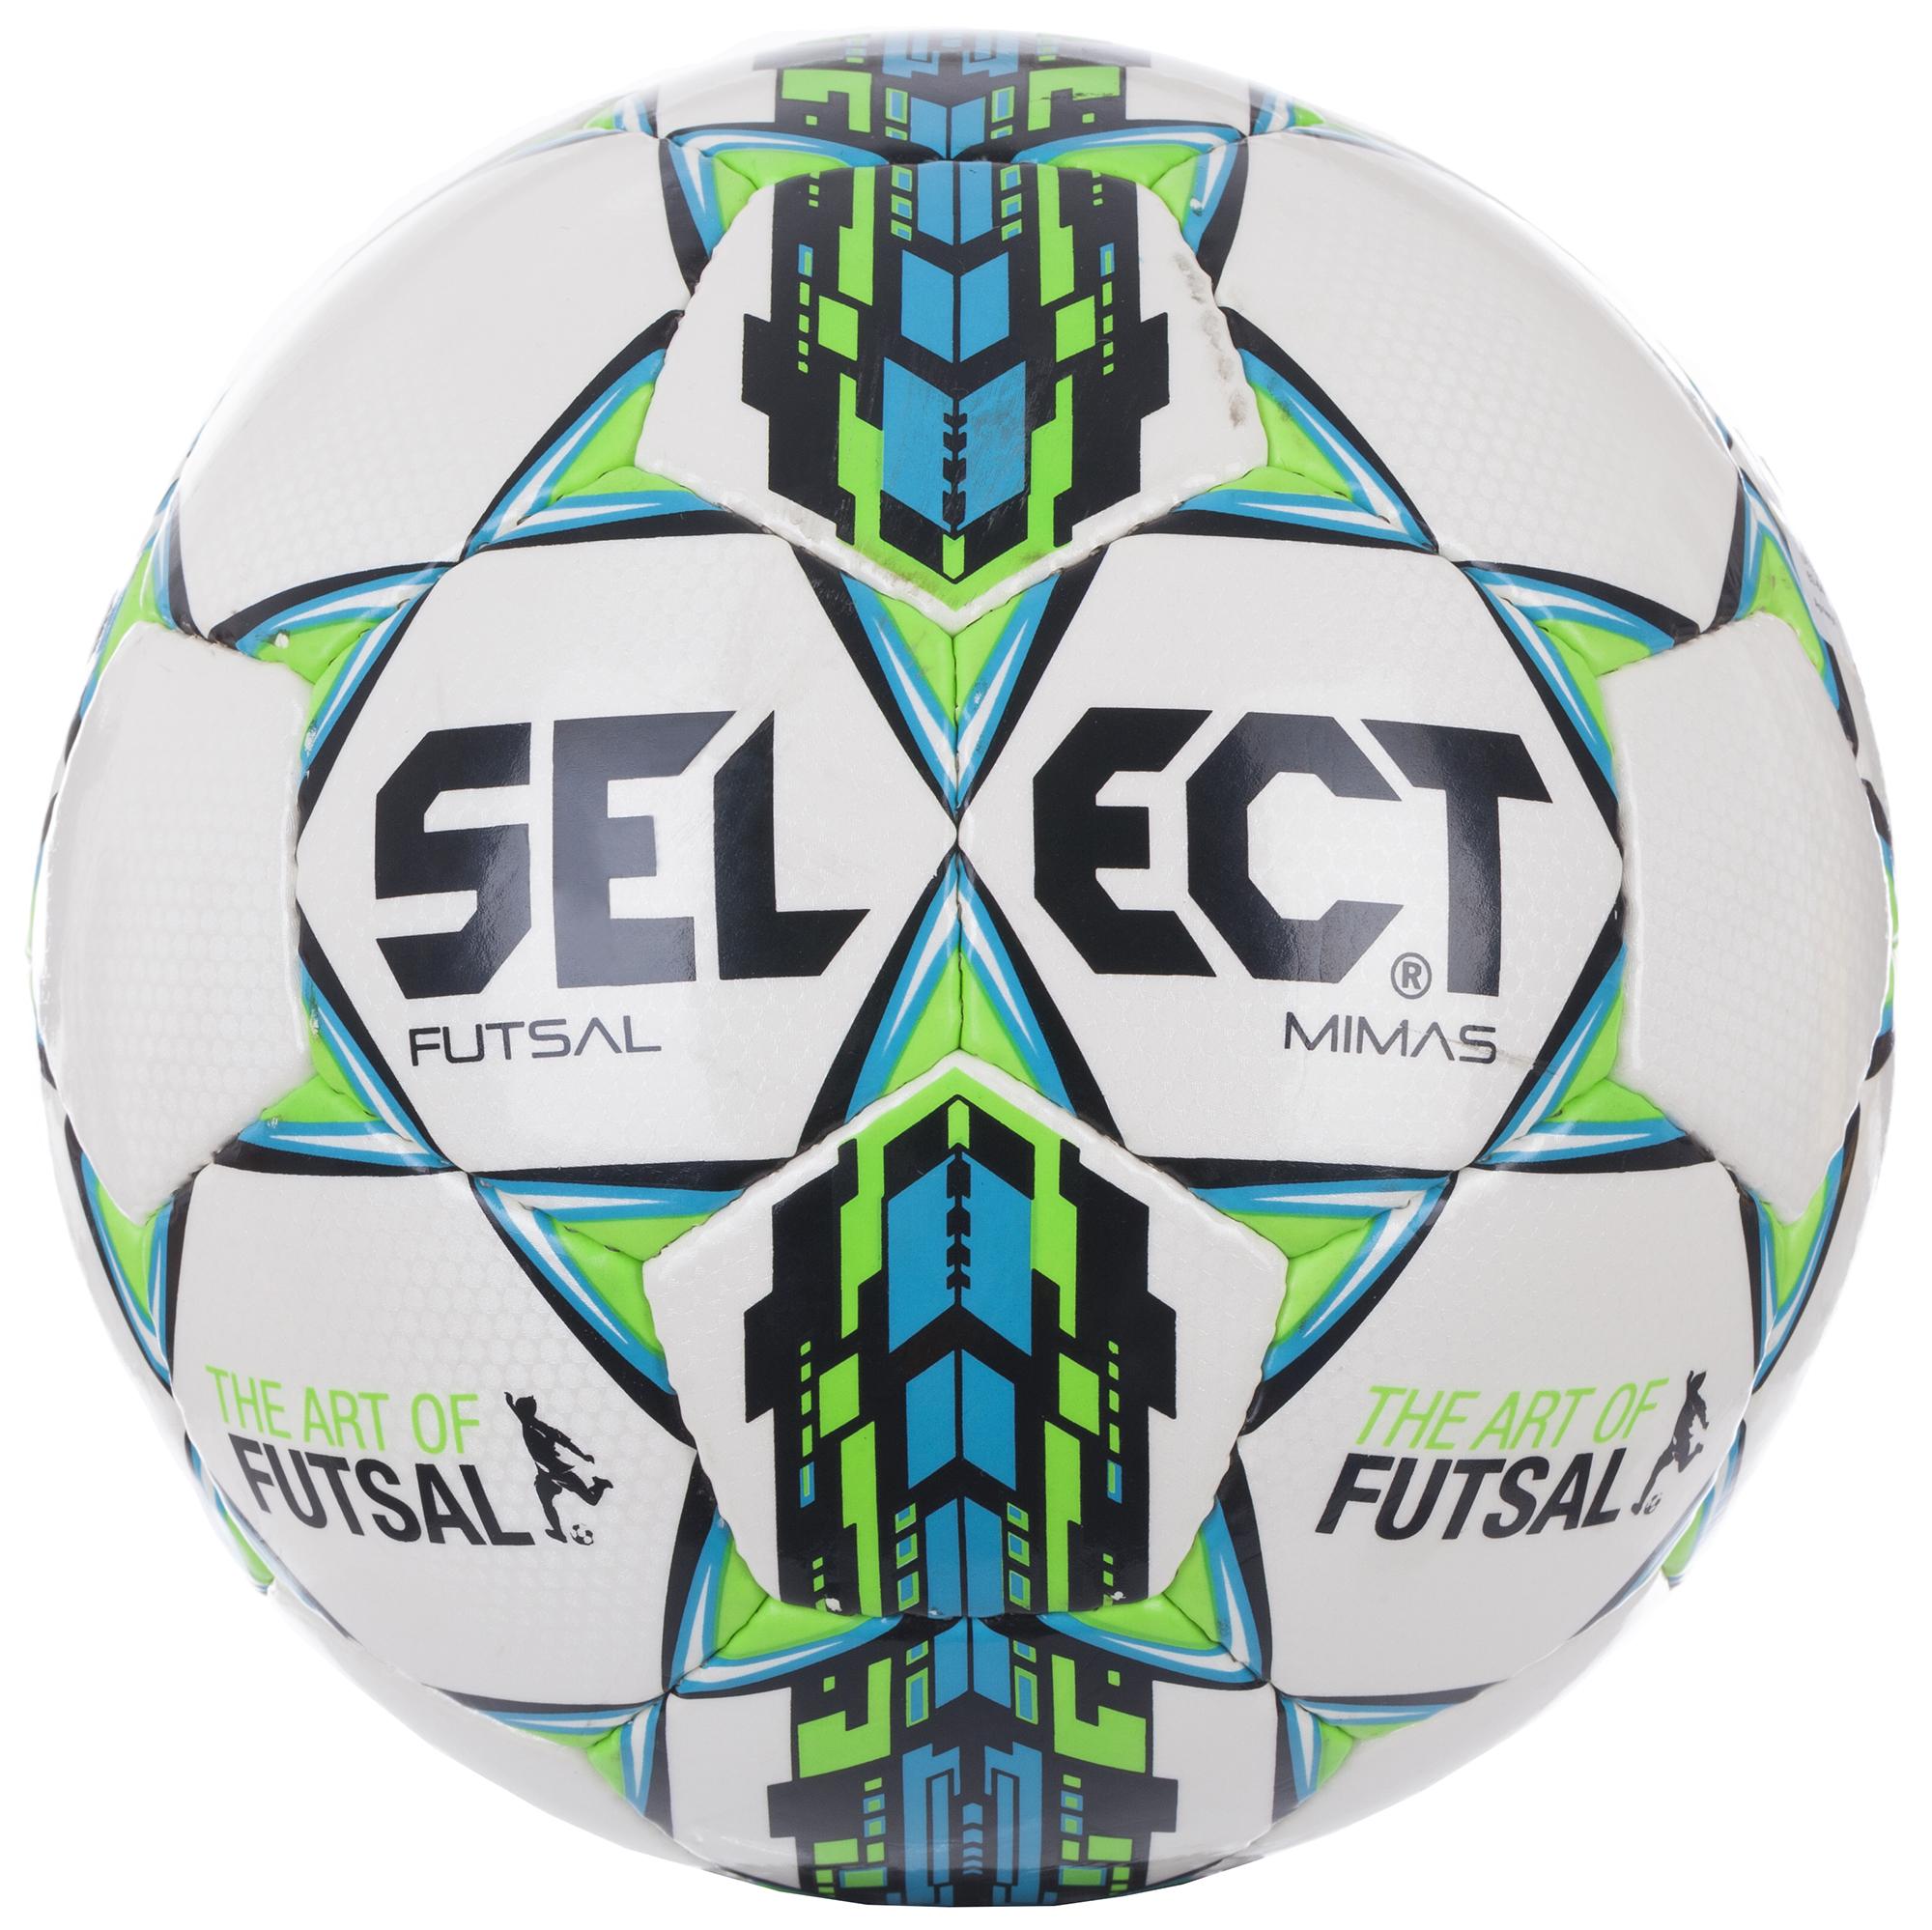 Select Мяч футбольный Select Futsal Mimas цена